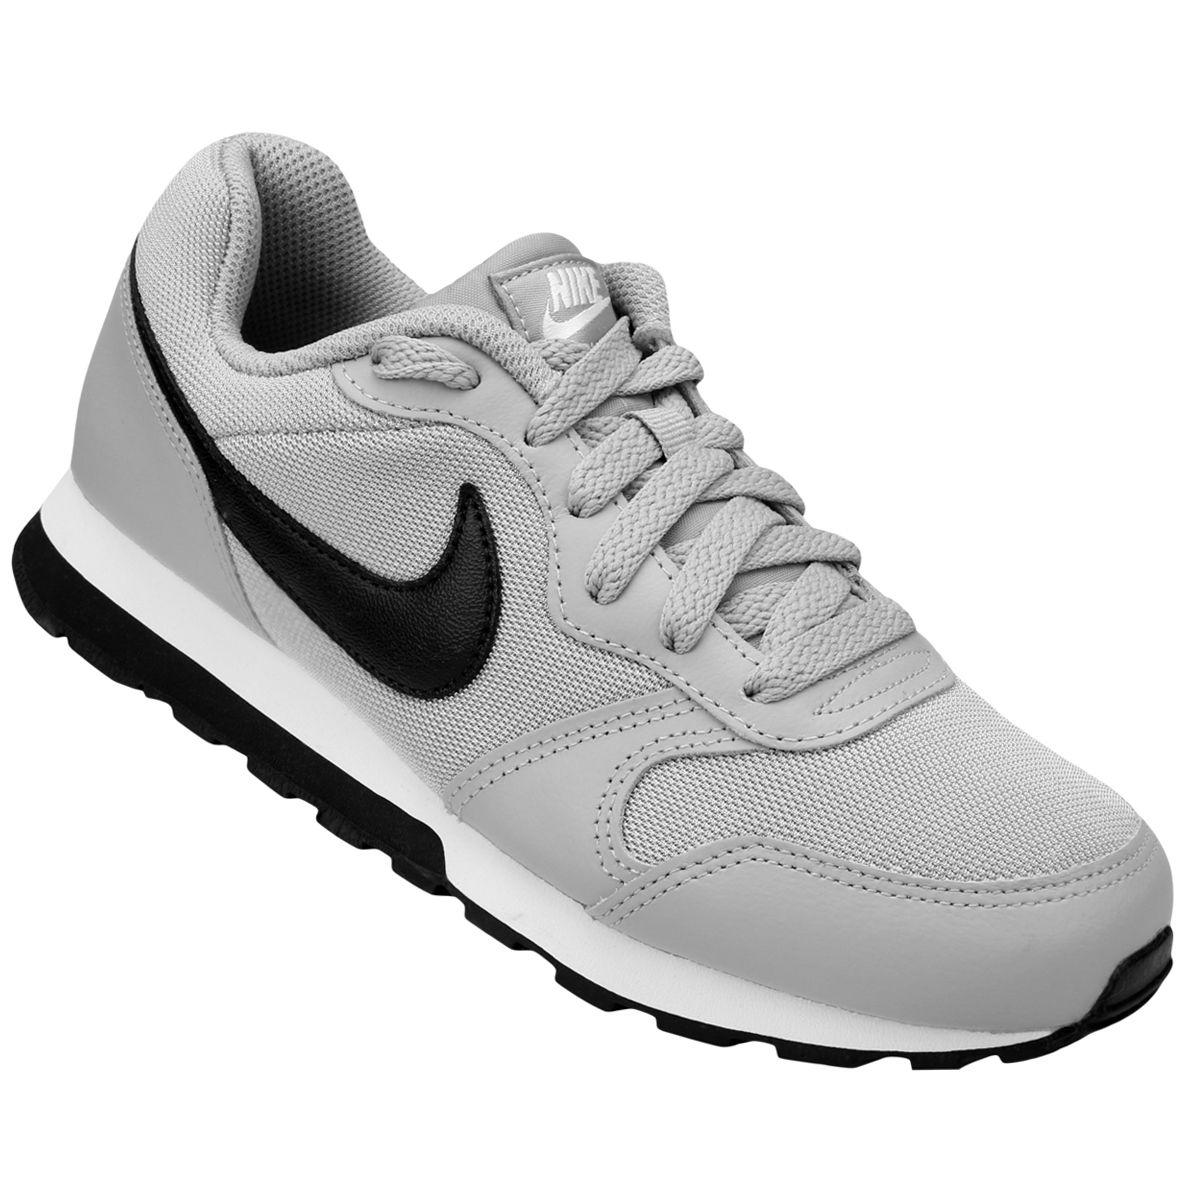 e7d62d8b2ea Tênis Infantil Nike Md Runner 2 - Cinza e Preto